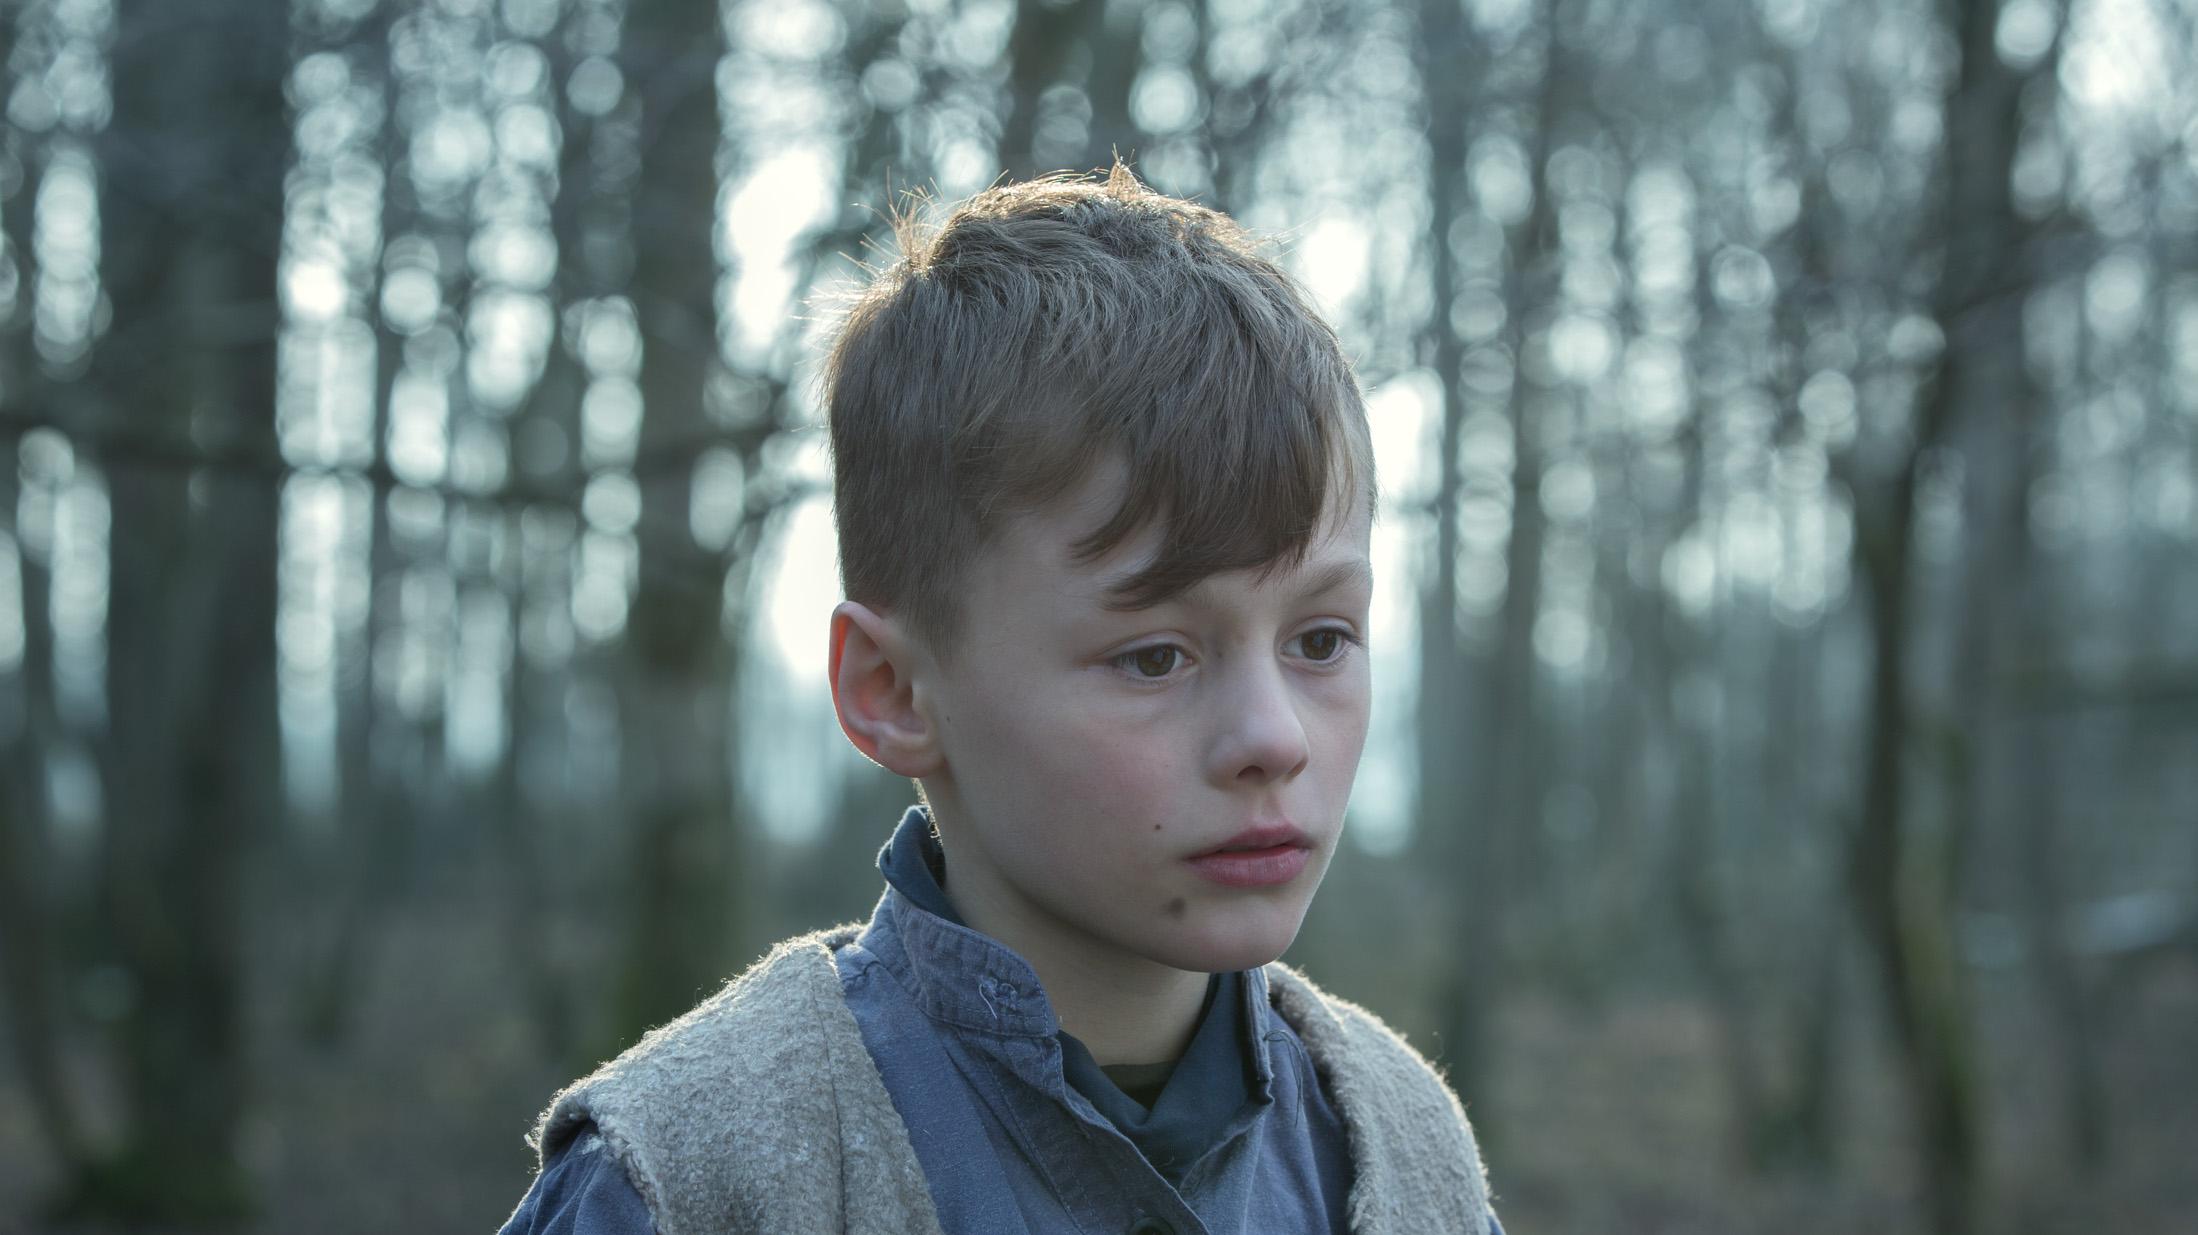 Jules Dezuttere in GLANSTIR FAN directed by Josse De Maesschalck - DoP Lander Verlinden - Courtesy WAANZIN FILMS